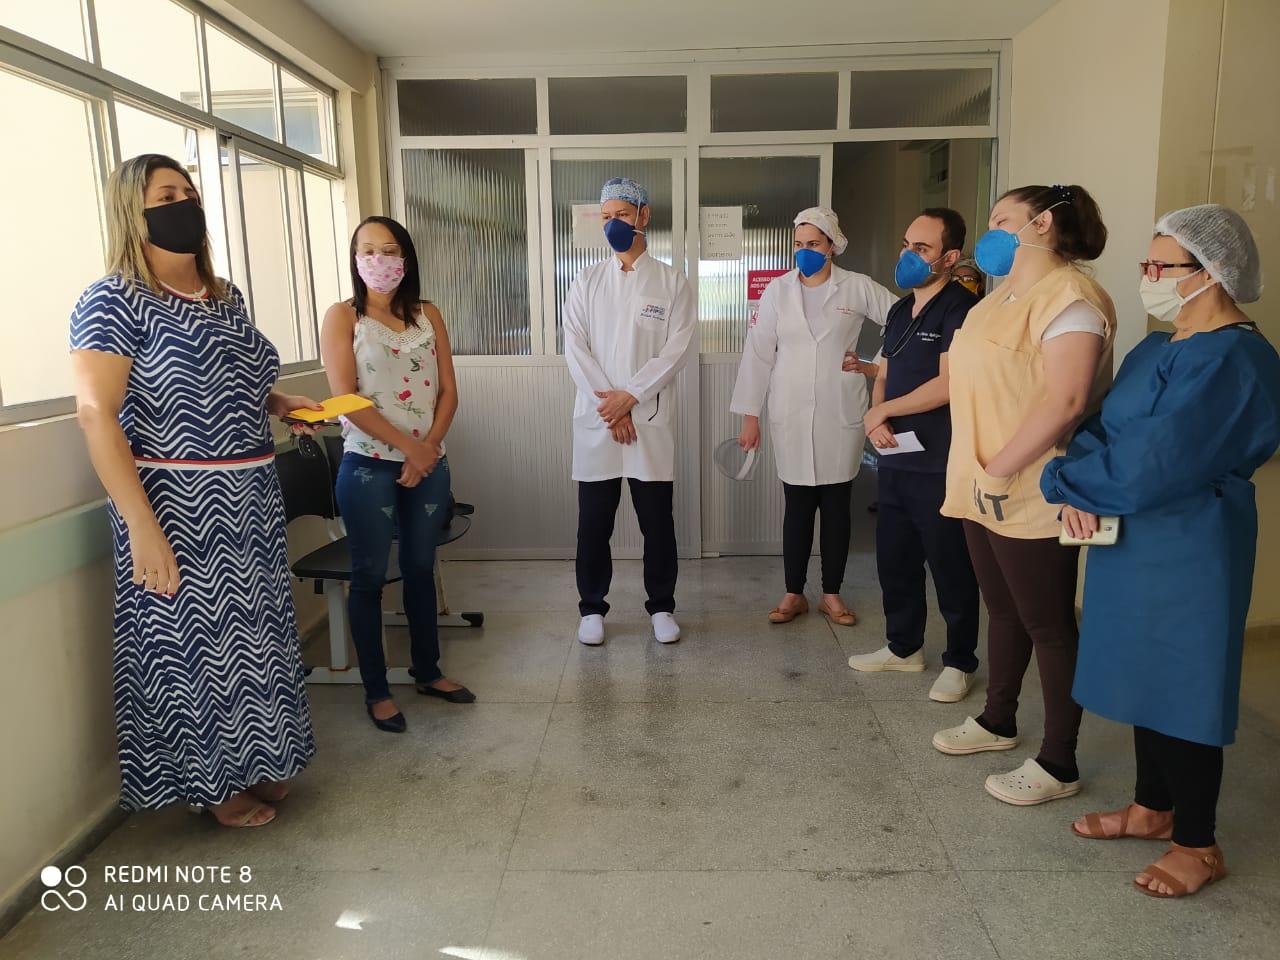 Equipe do Hospital Maria Rafael de SJE  arrecada recurso para enfermeira que teve moto roubada comprar outra